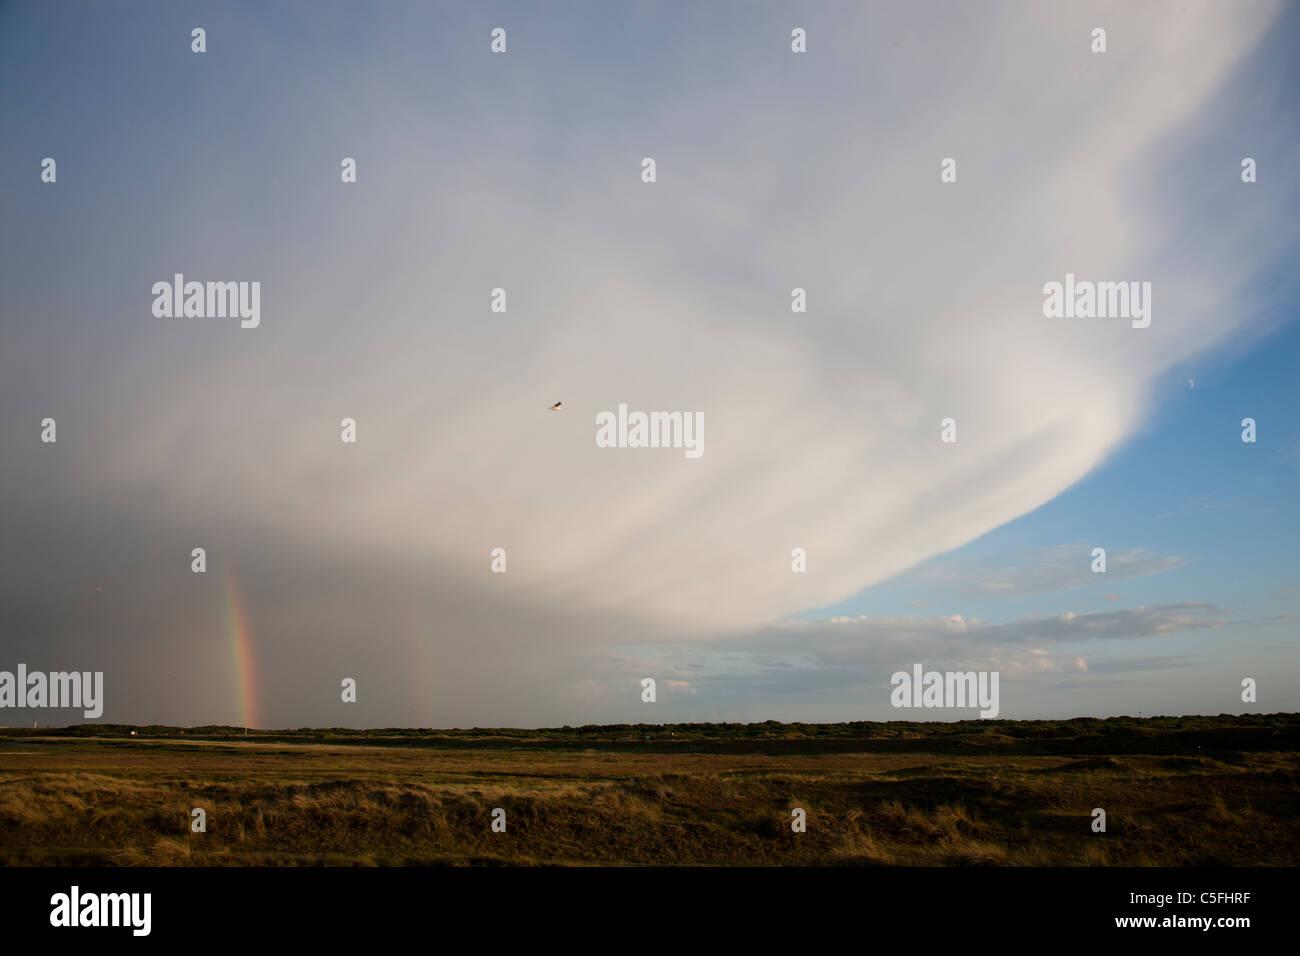 Cumulonimbus with a rainbow - Stock Image